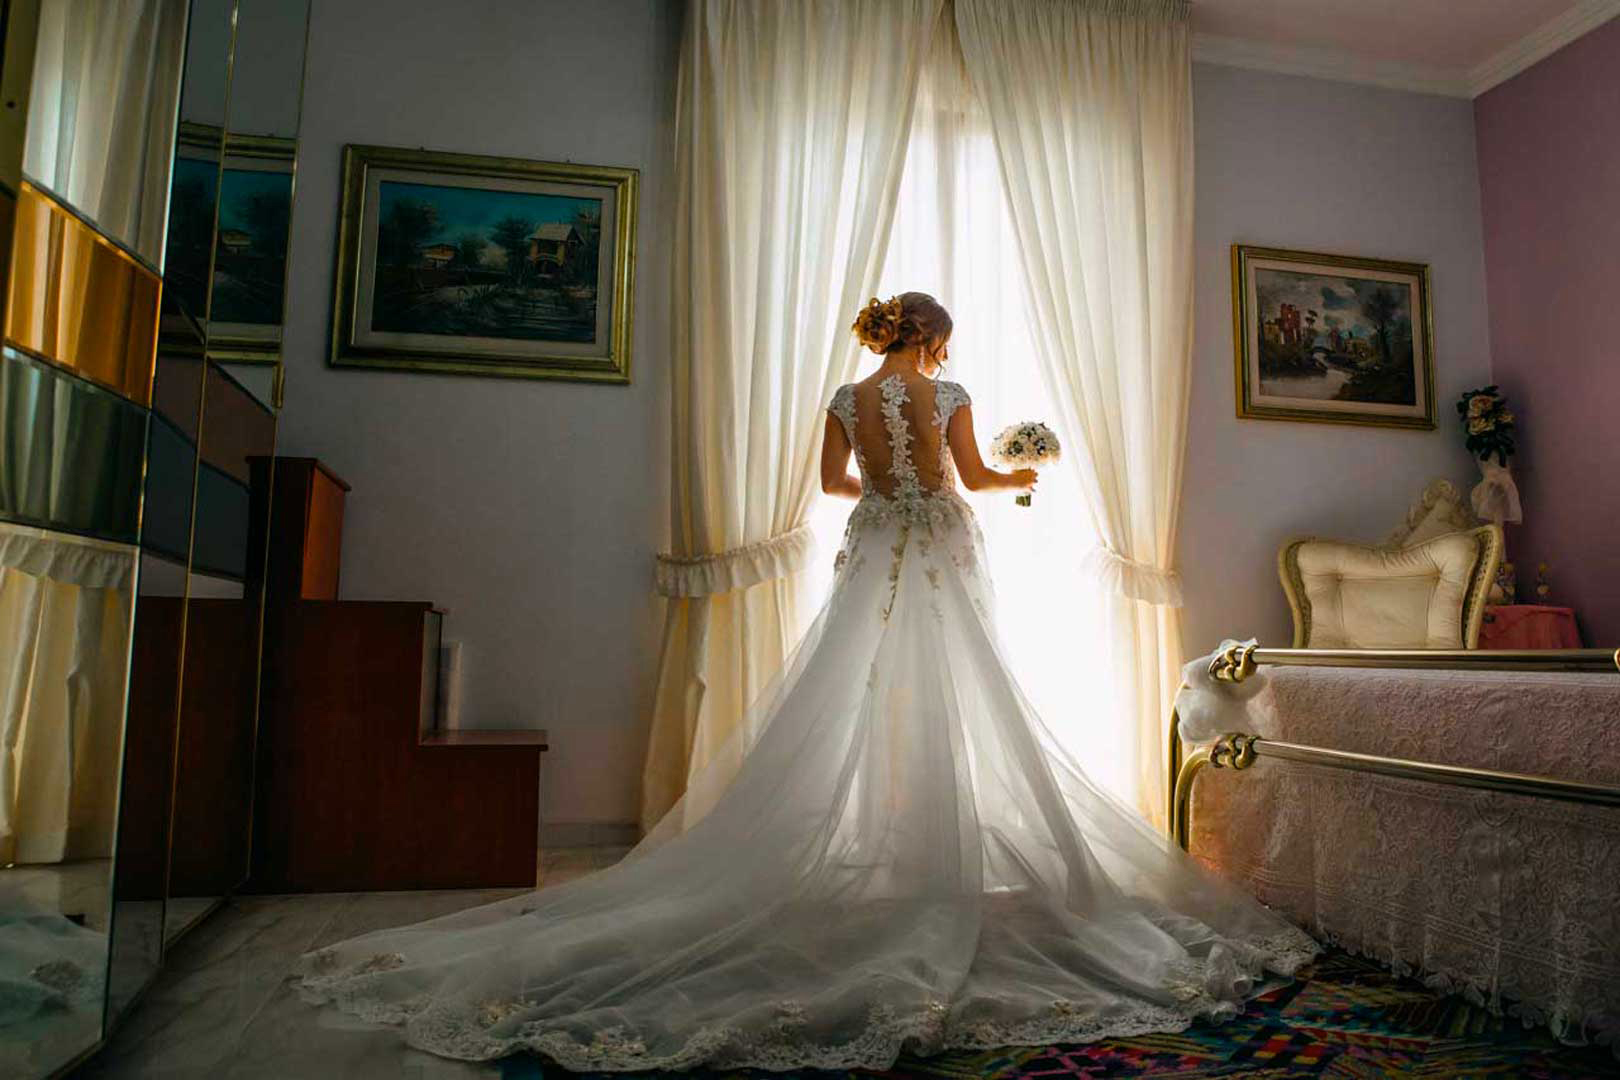 011-sposa-gianni-lepore-fotografia-puglia